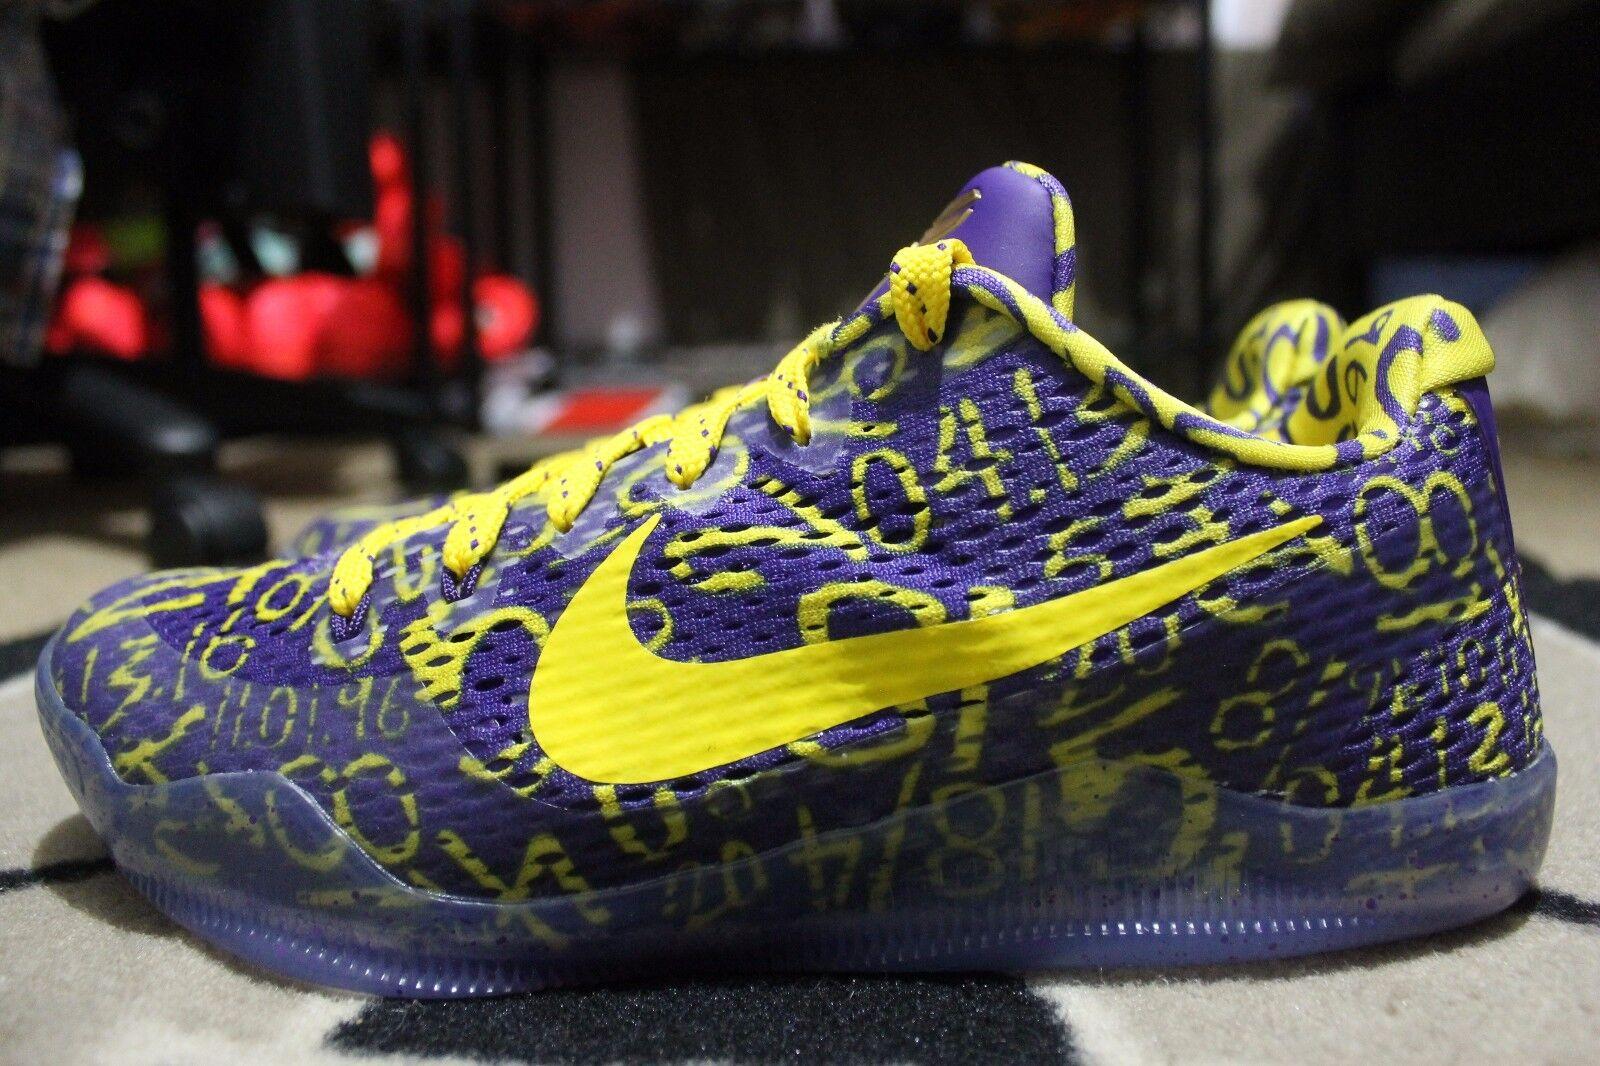 NEW Nike Kobe Nike XI 11 Mamba Day Nike Kobe iD Size 8.5 Purple/Gold  (865773-993) b25aba